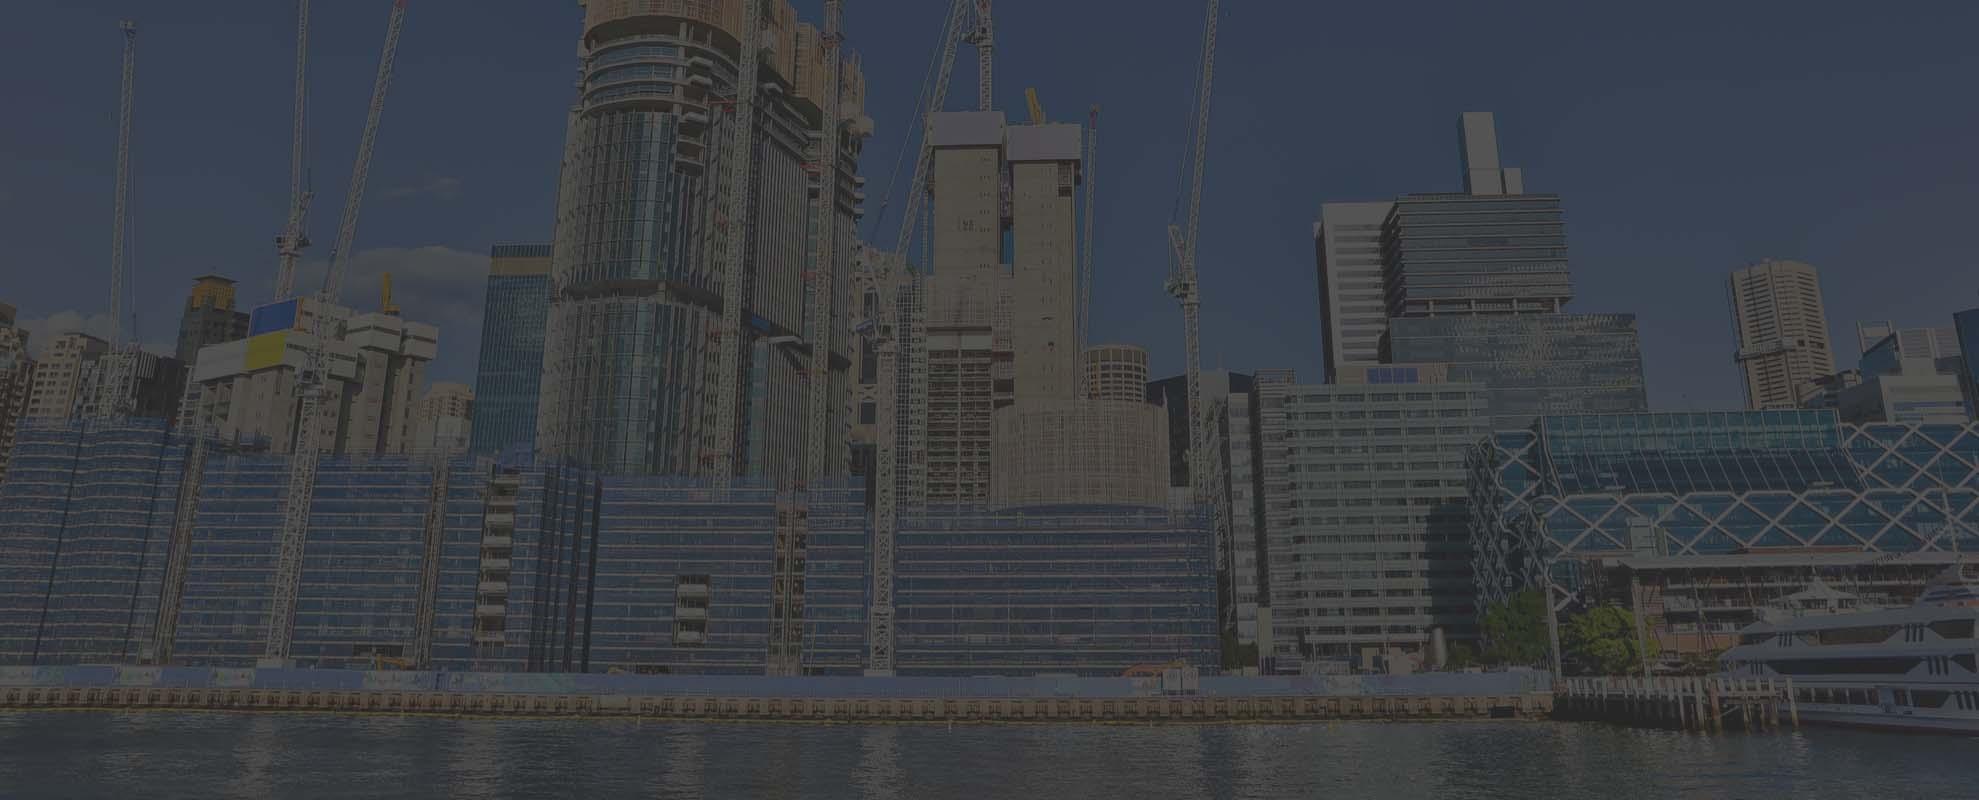 STRATA & CONSTRUCTION